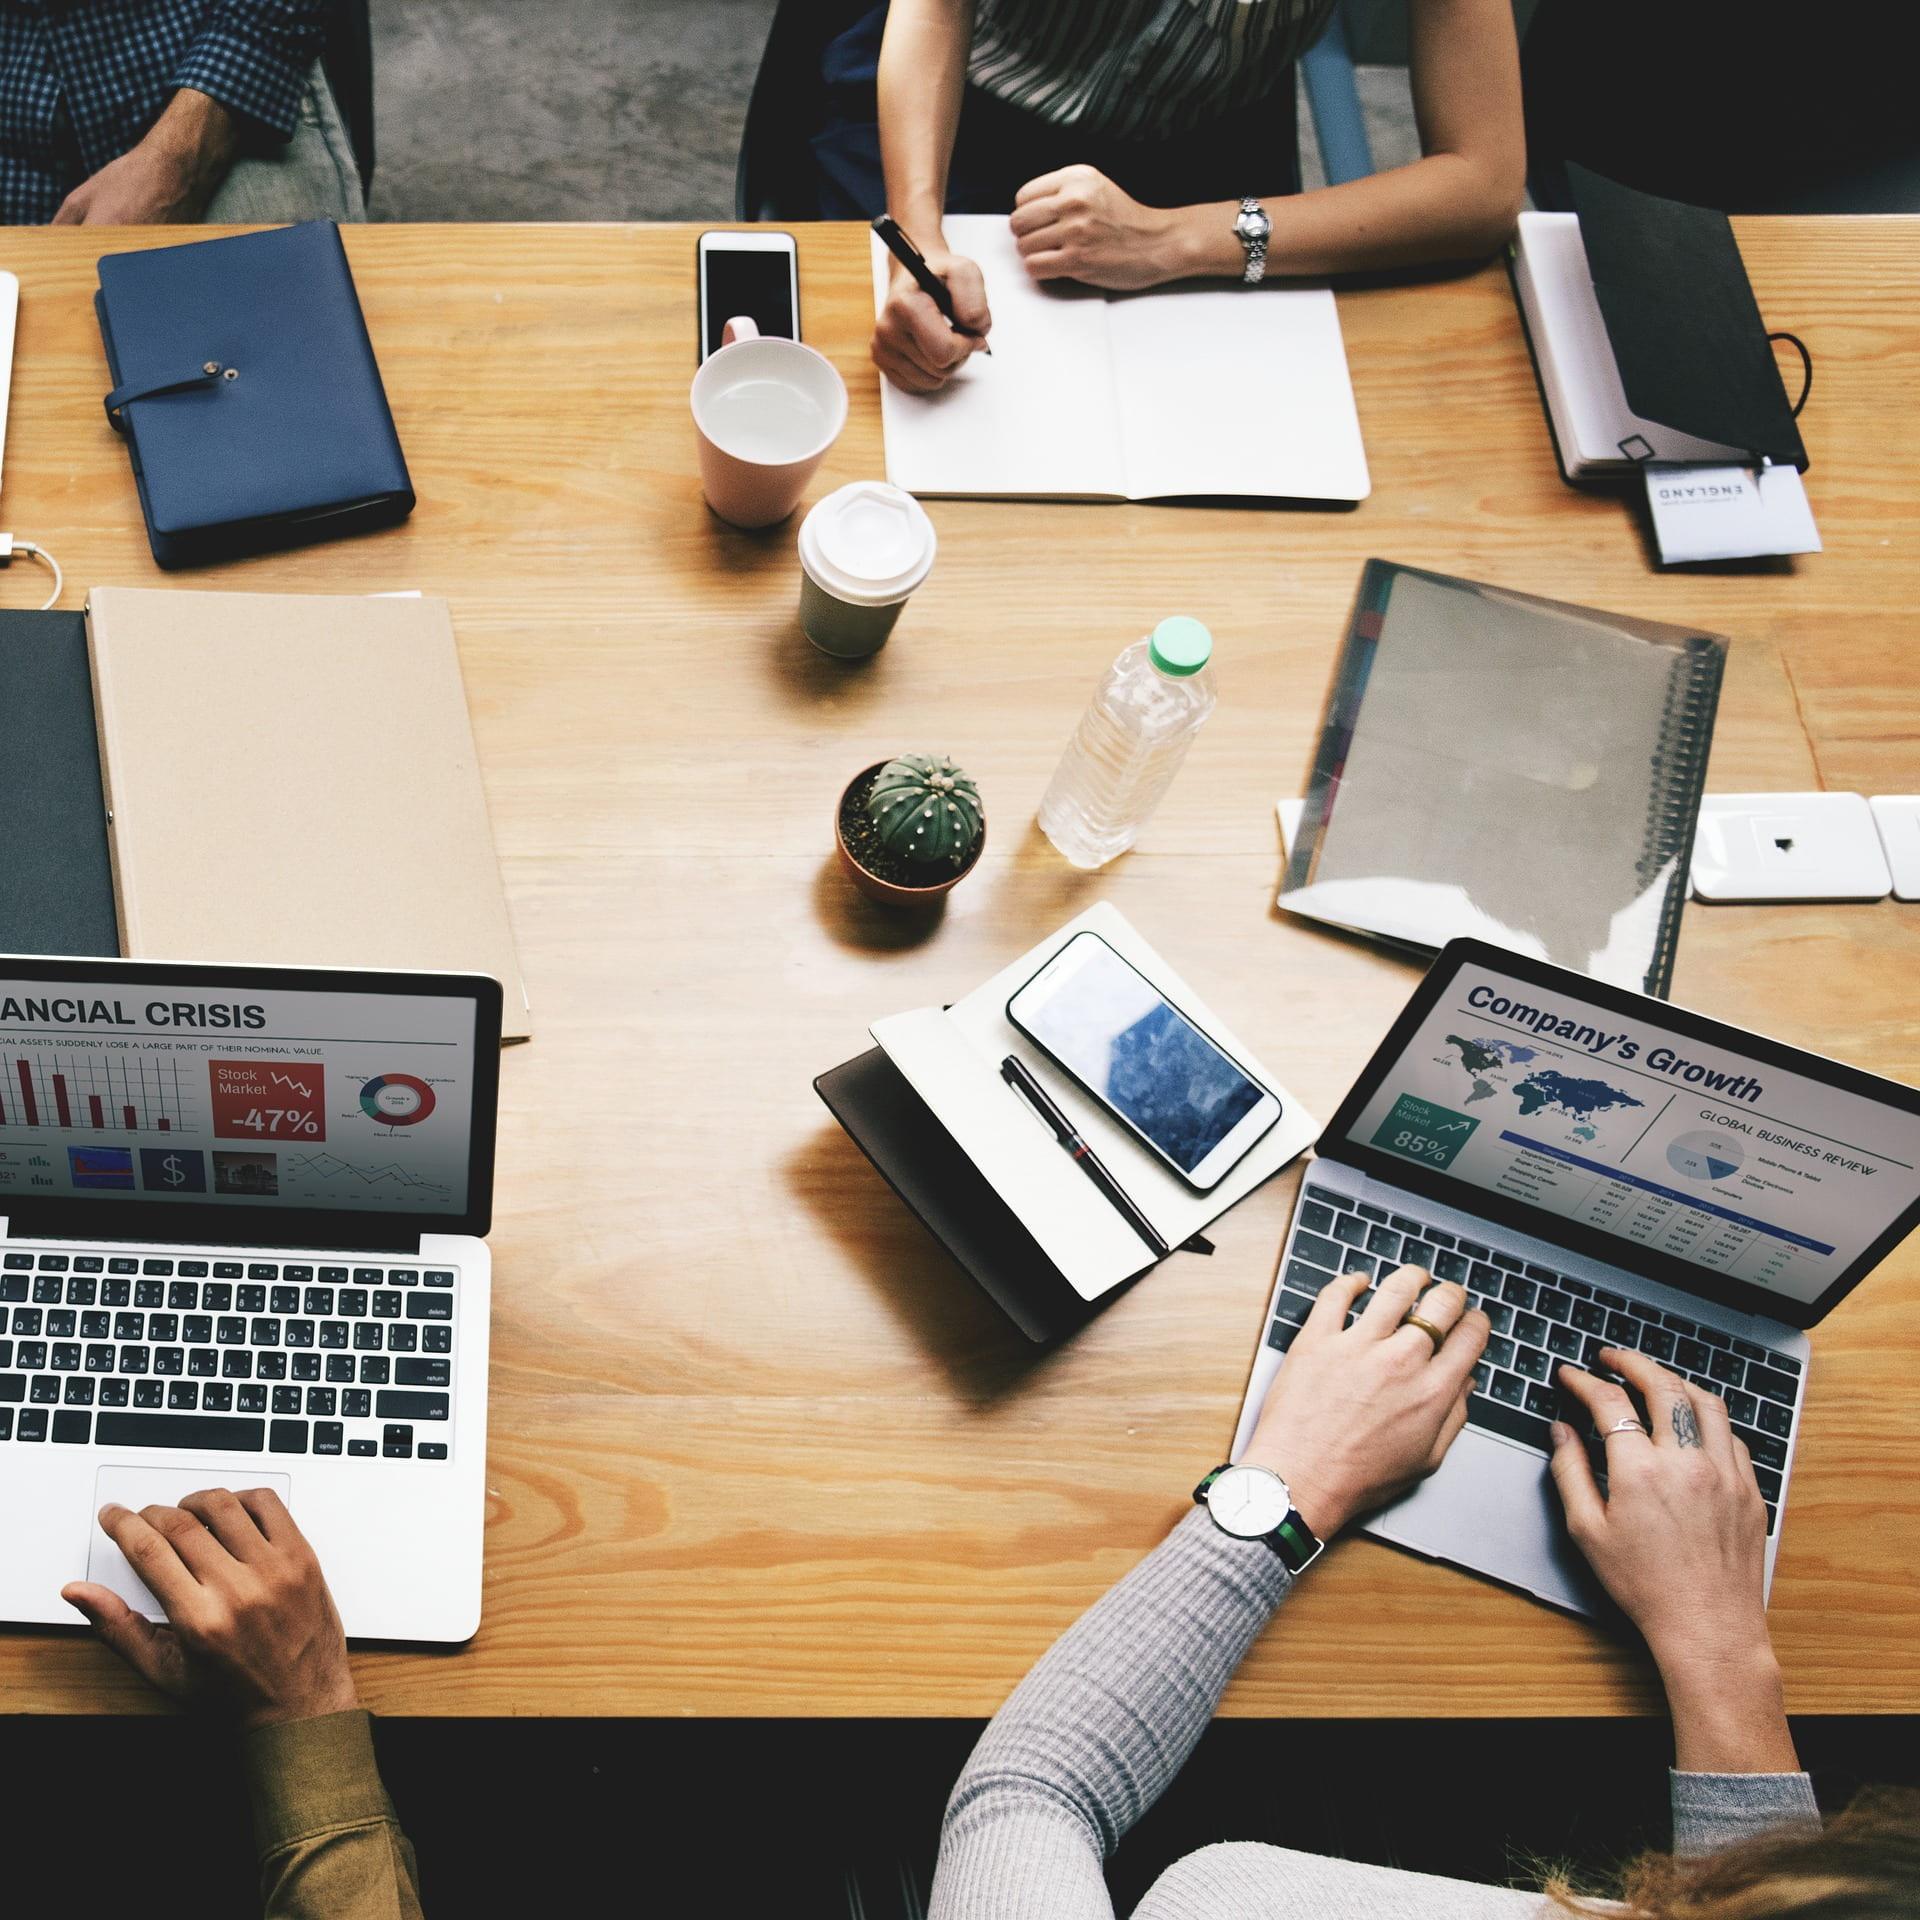 Collaboration drives innovation